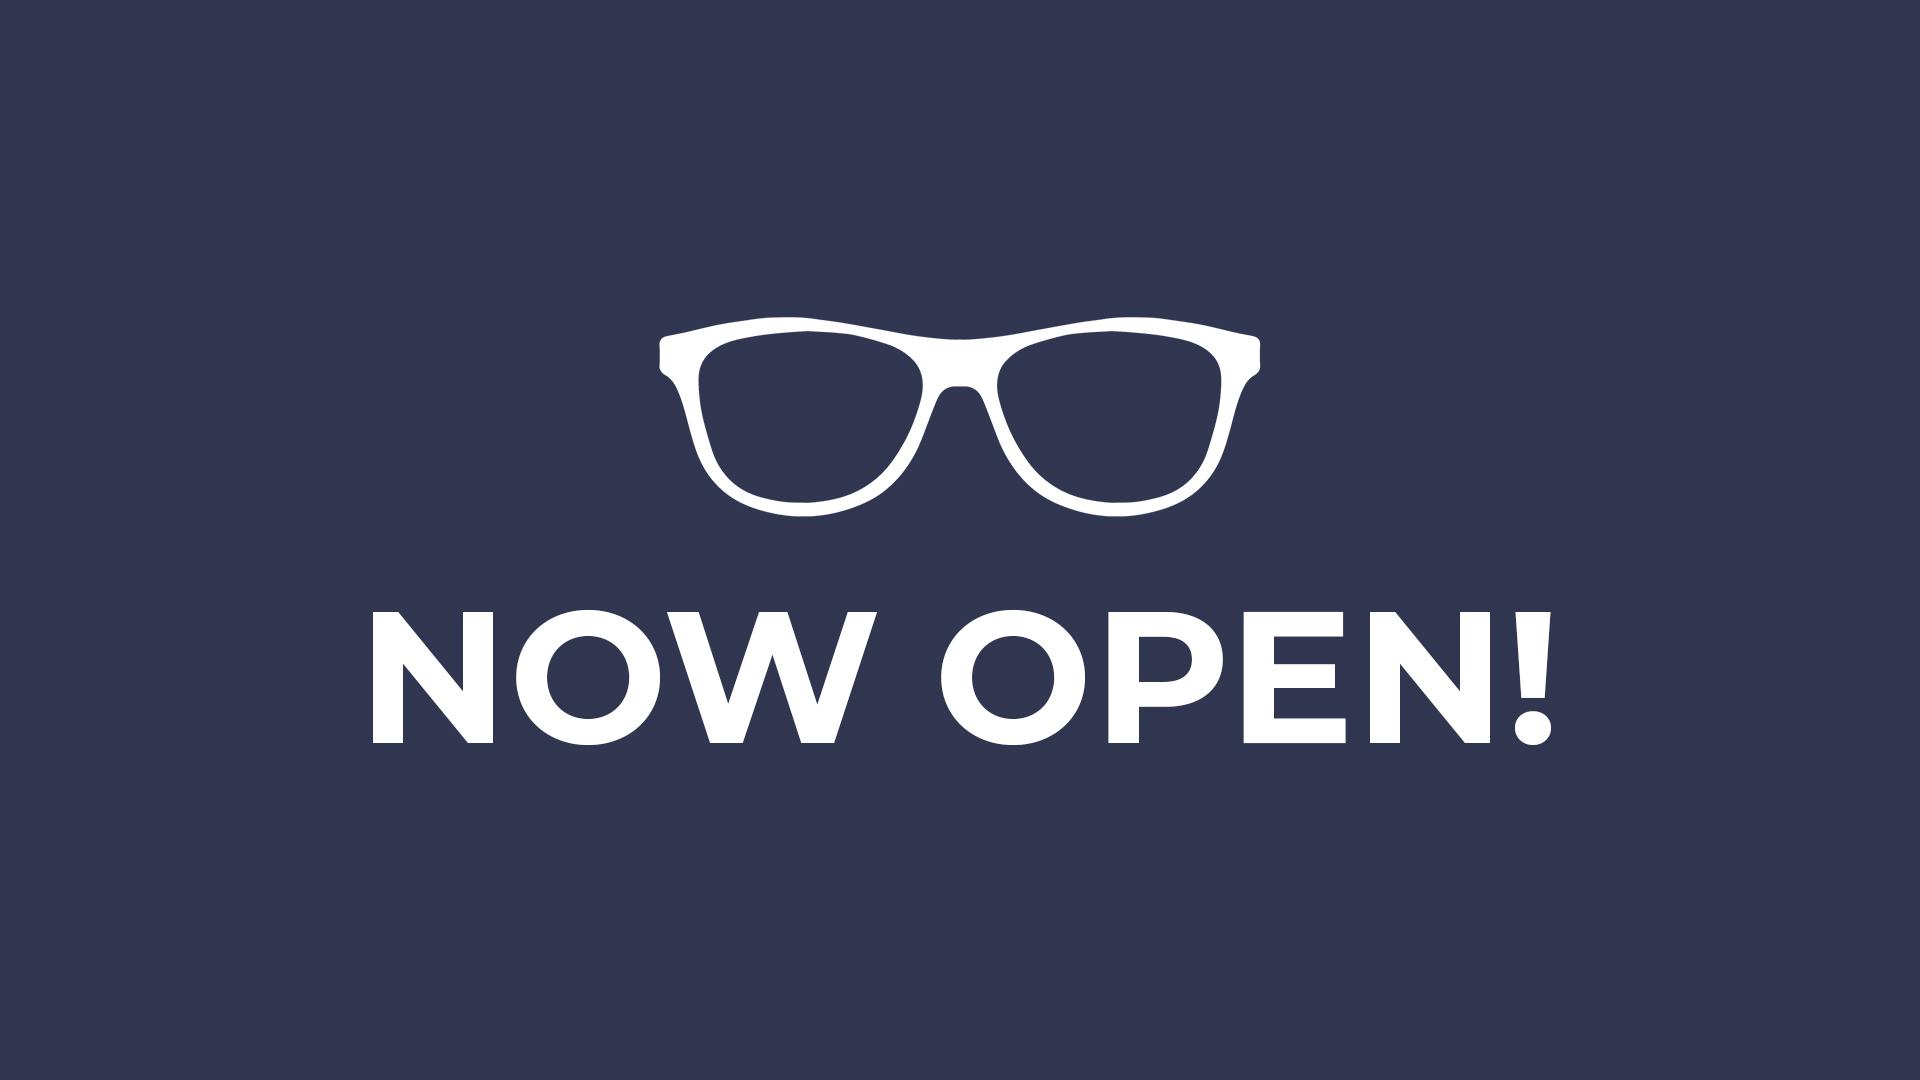 Squint-eyewear-Open-now